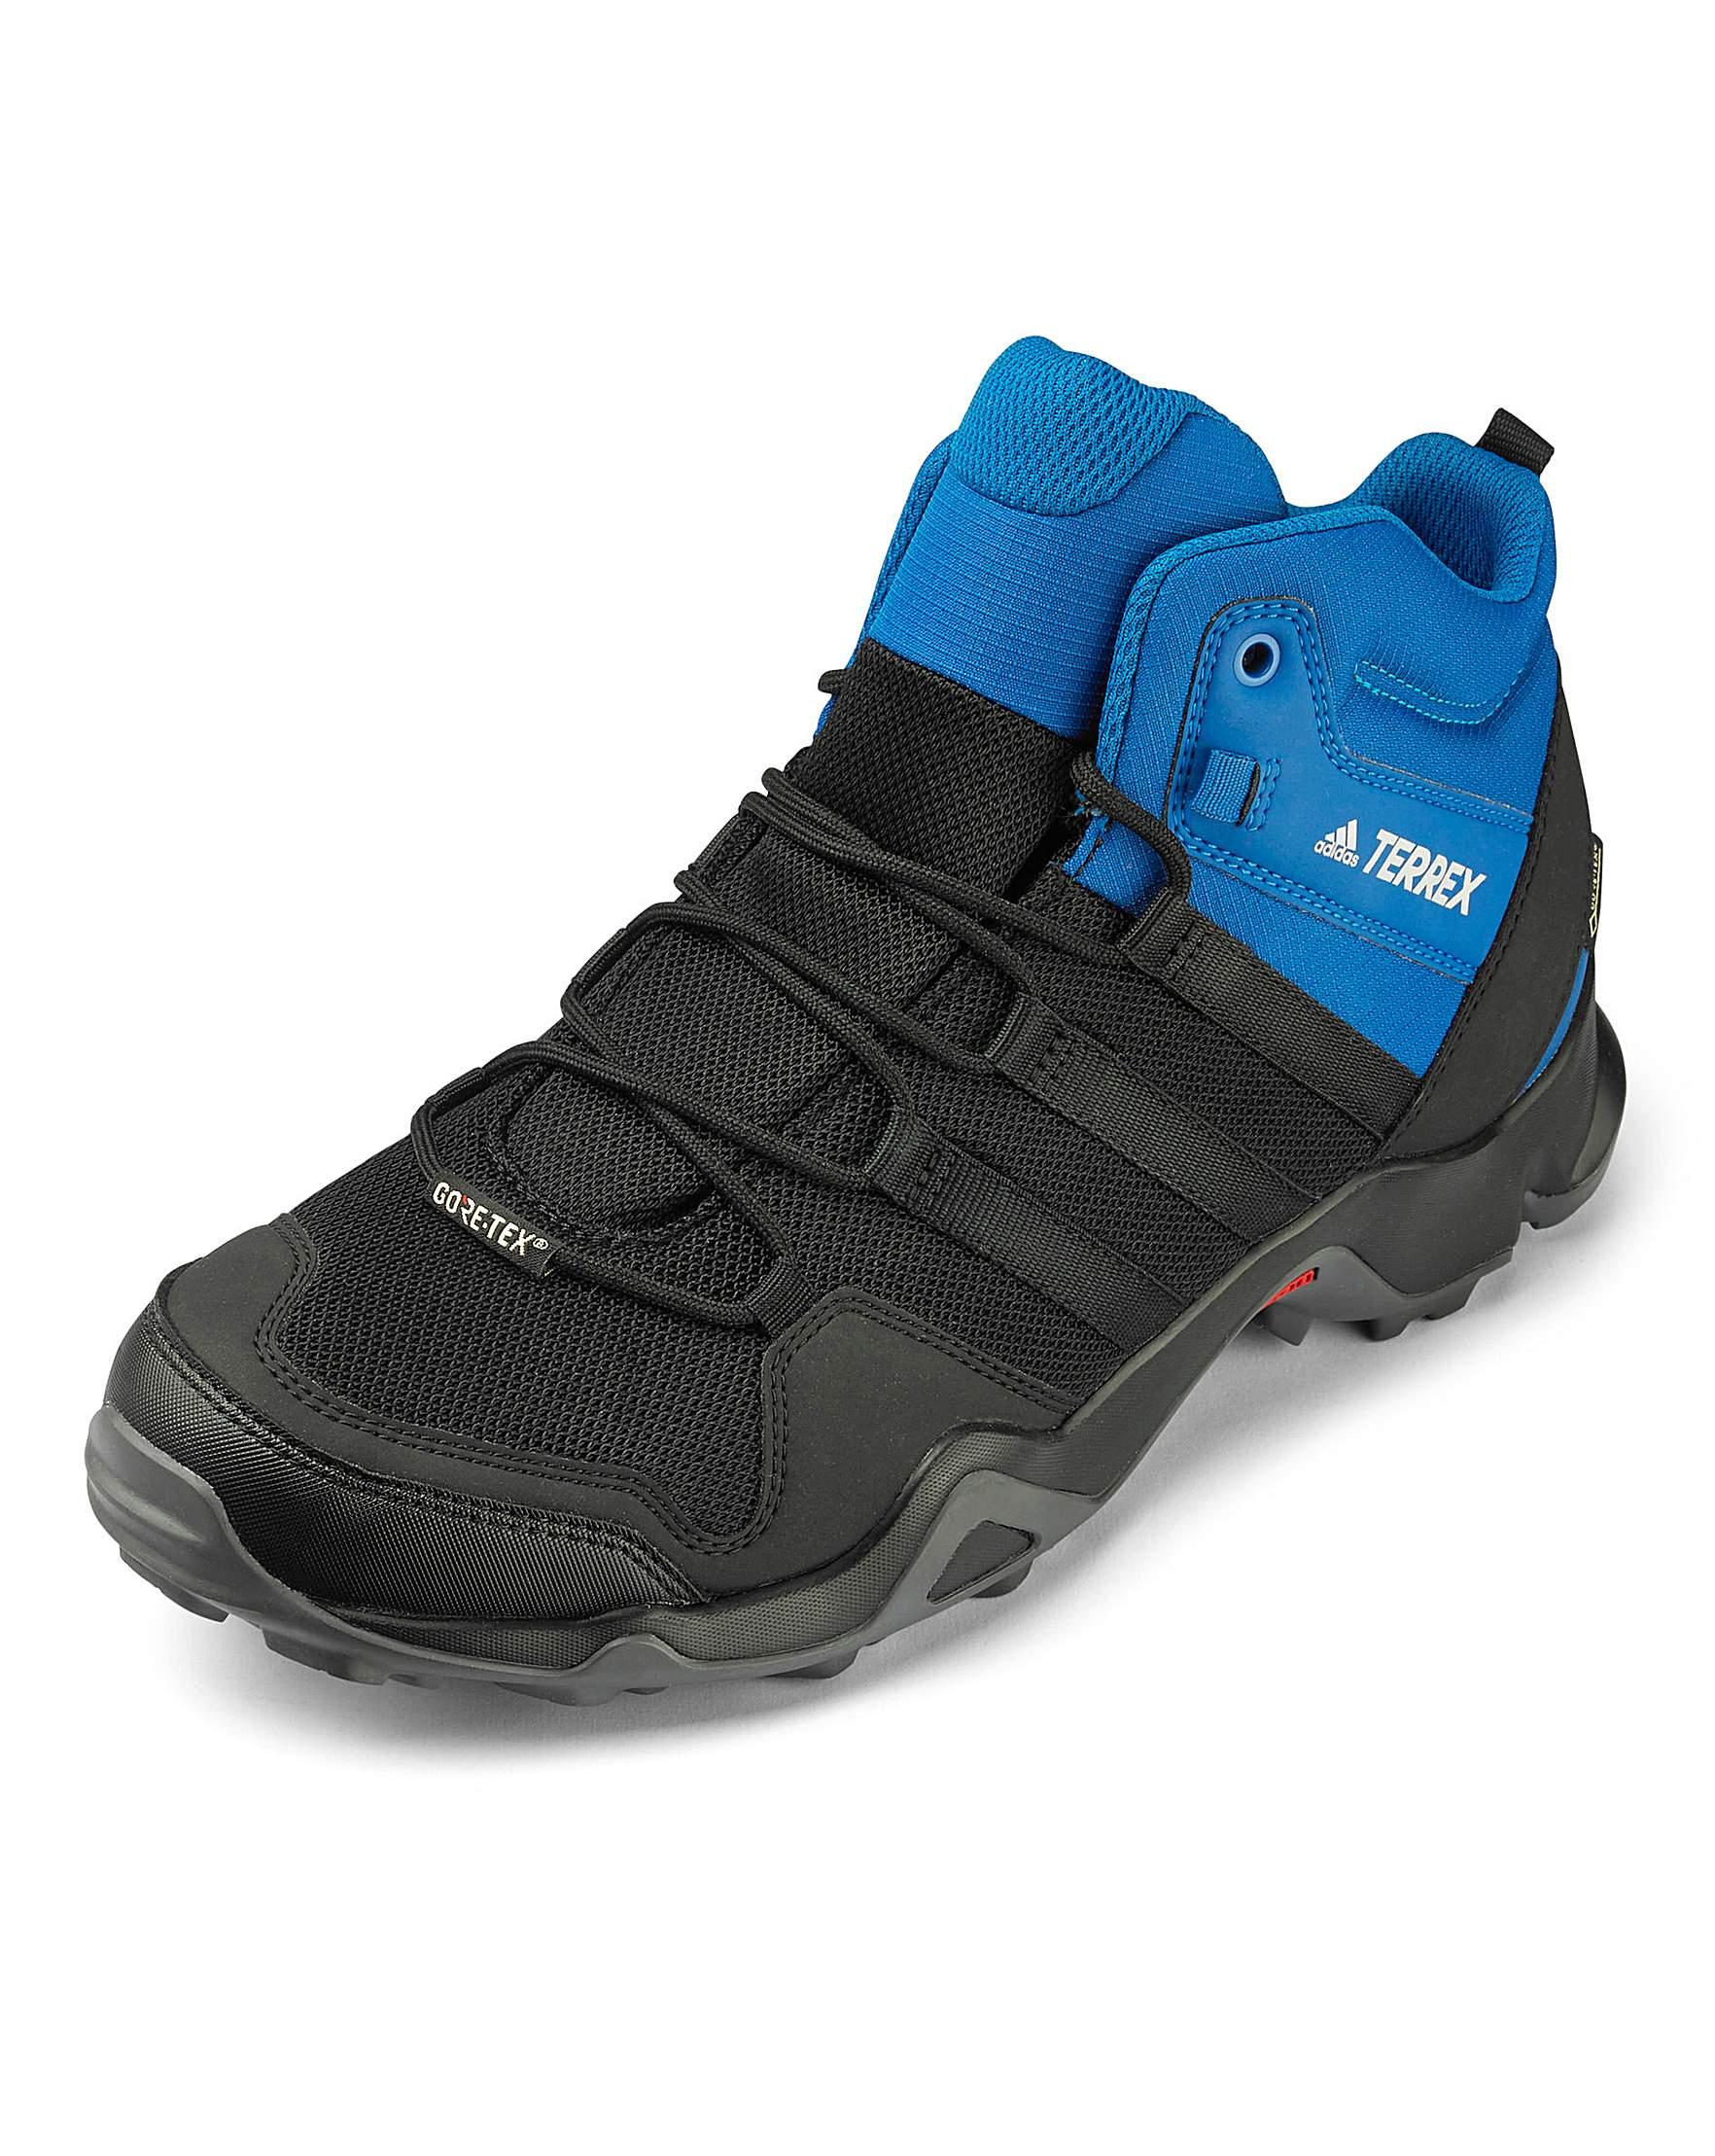 adidas goretex trainers